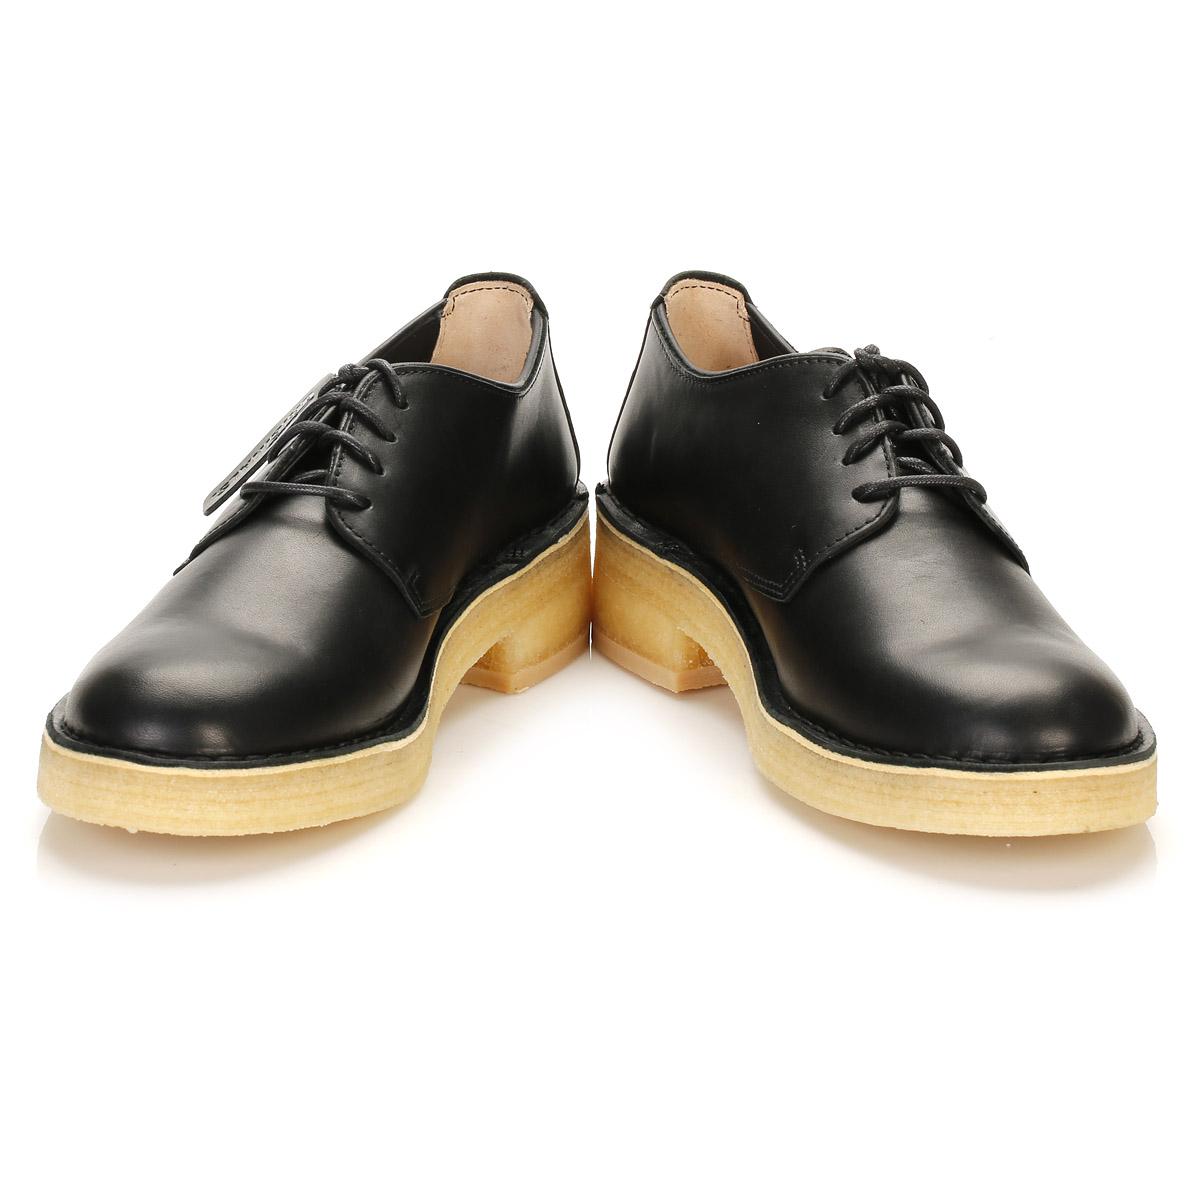 Clarks London Derby Shoes